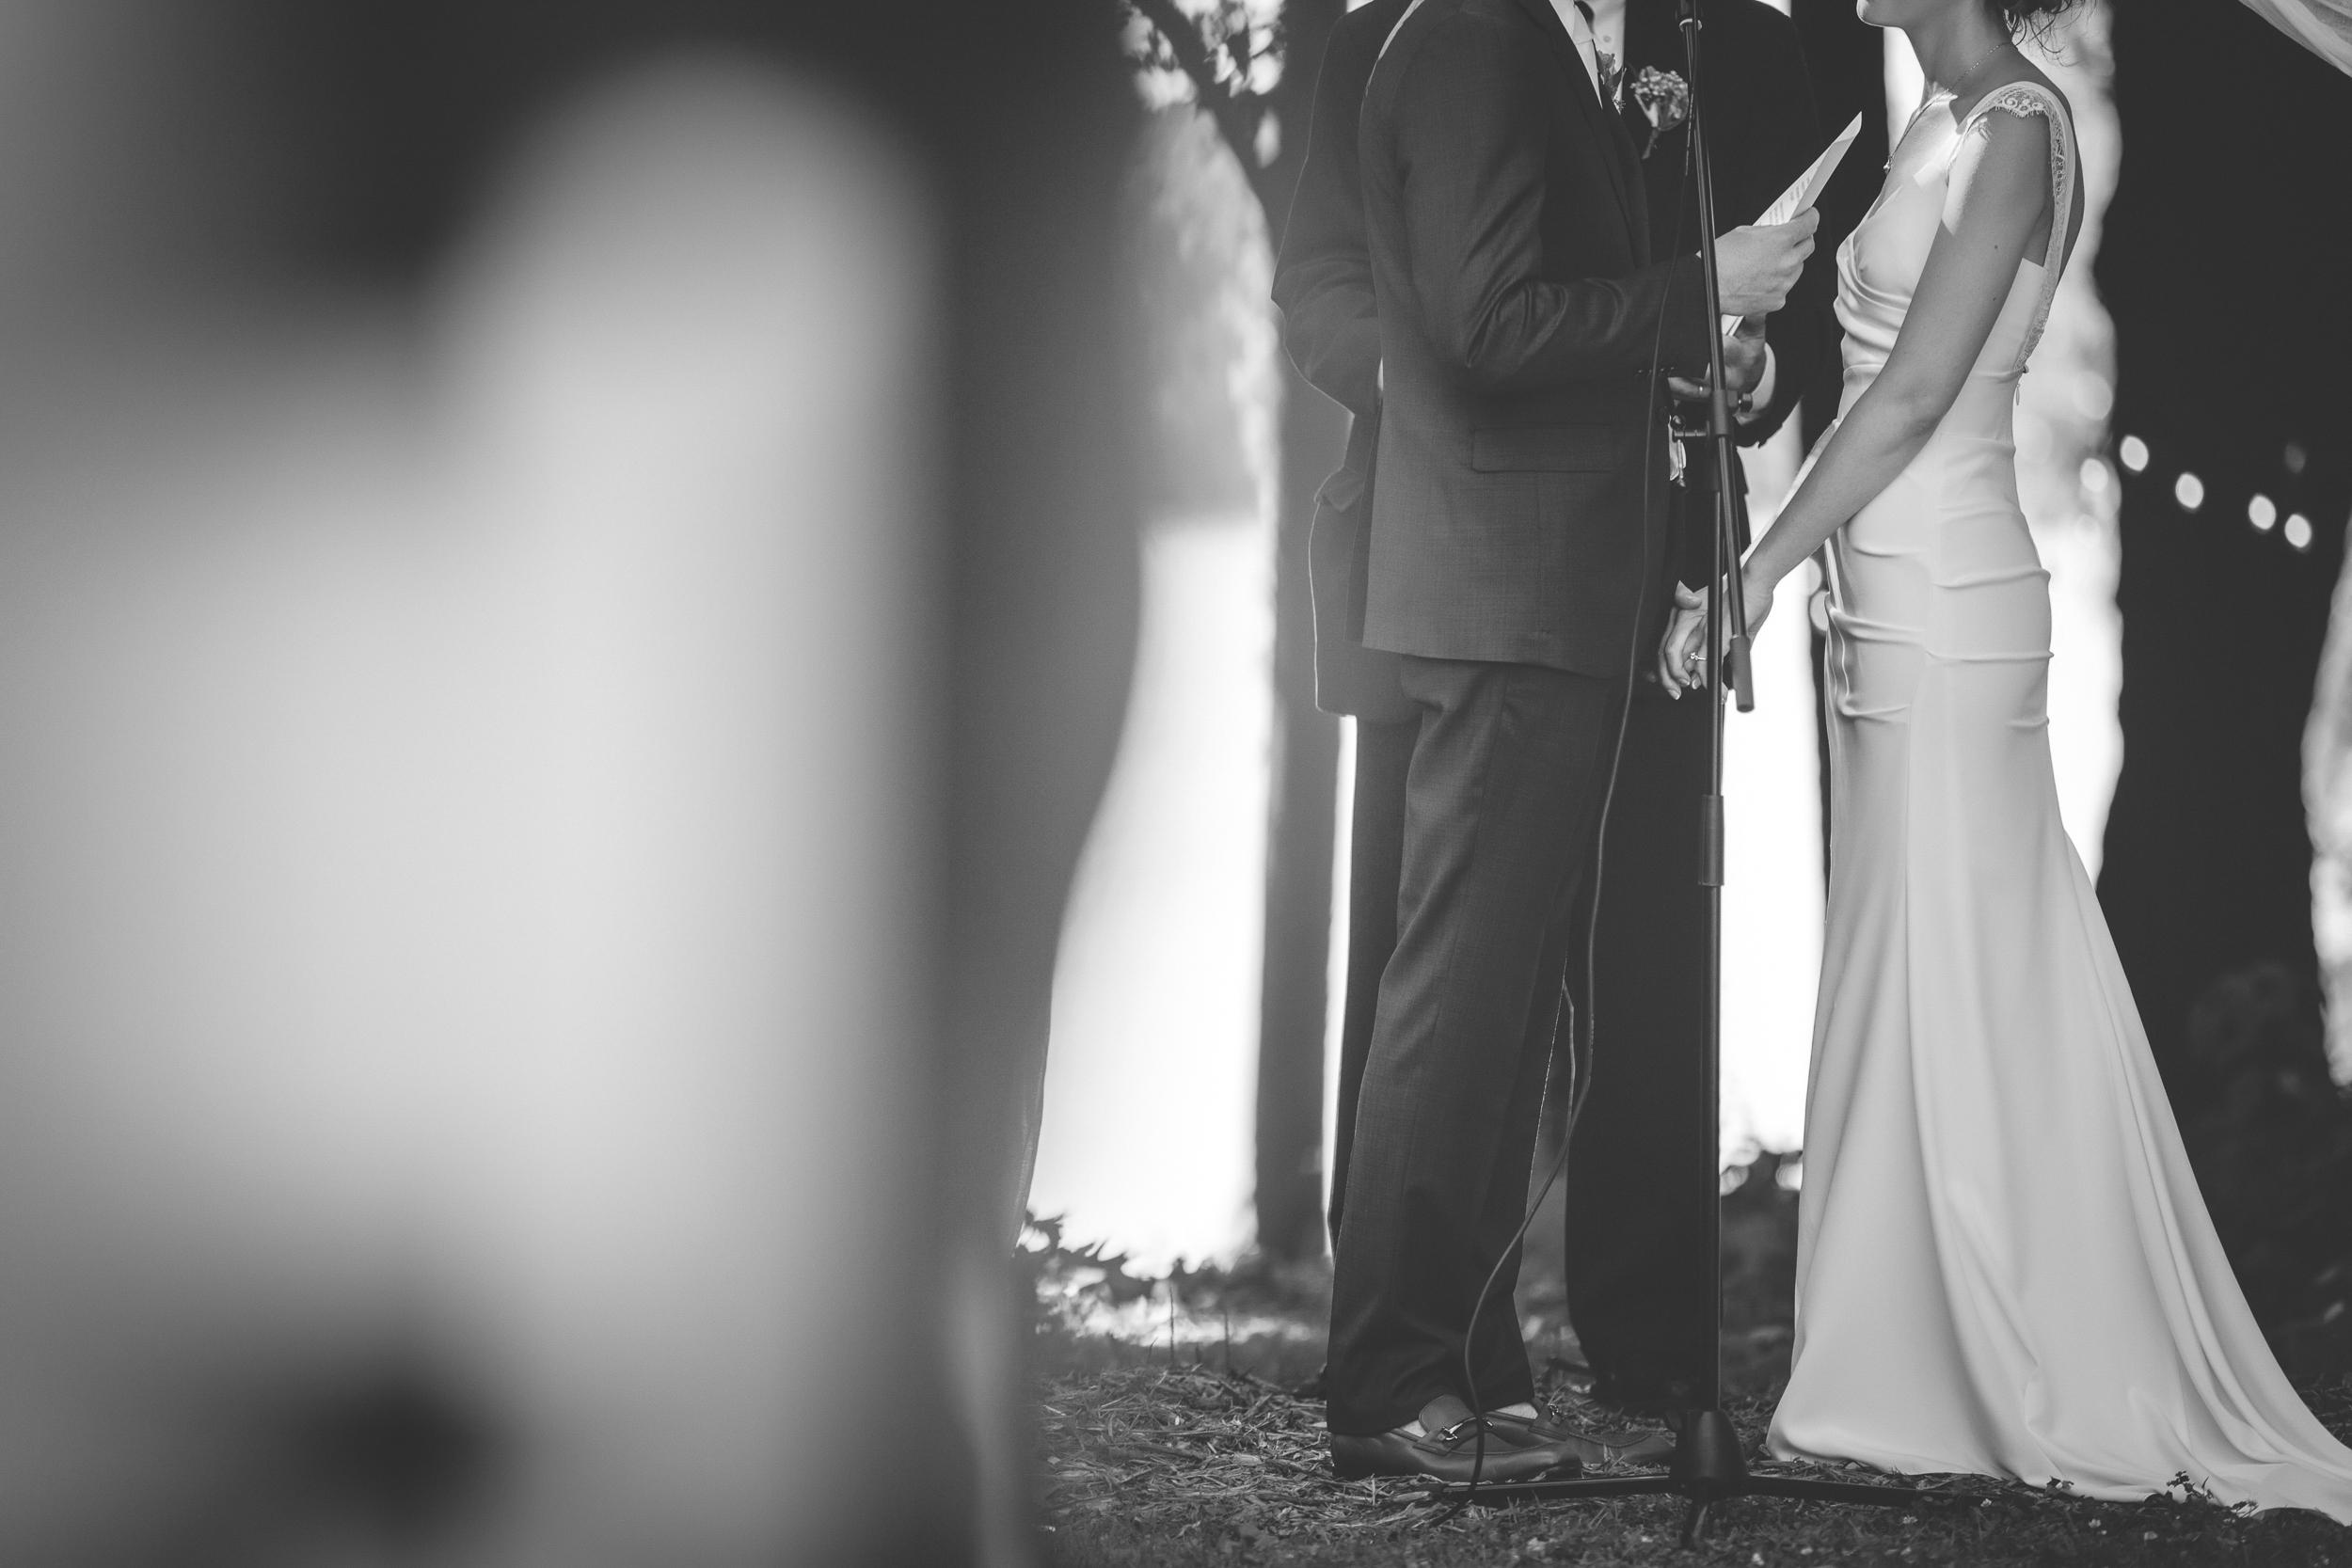 53 Minneapolis home backyard outdoor wedding ceremony 9.jpg